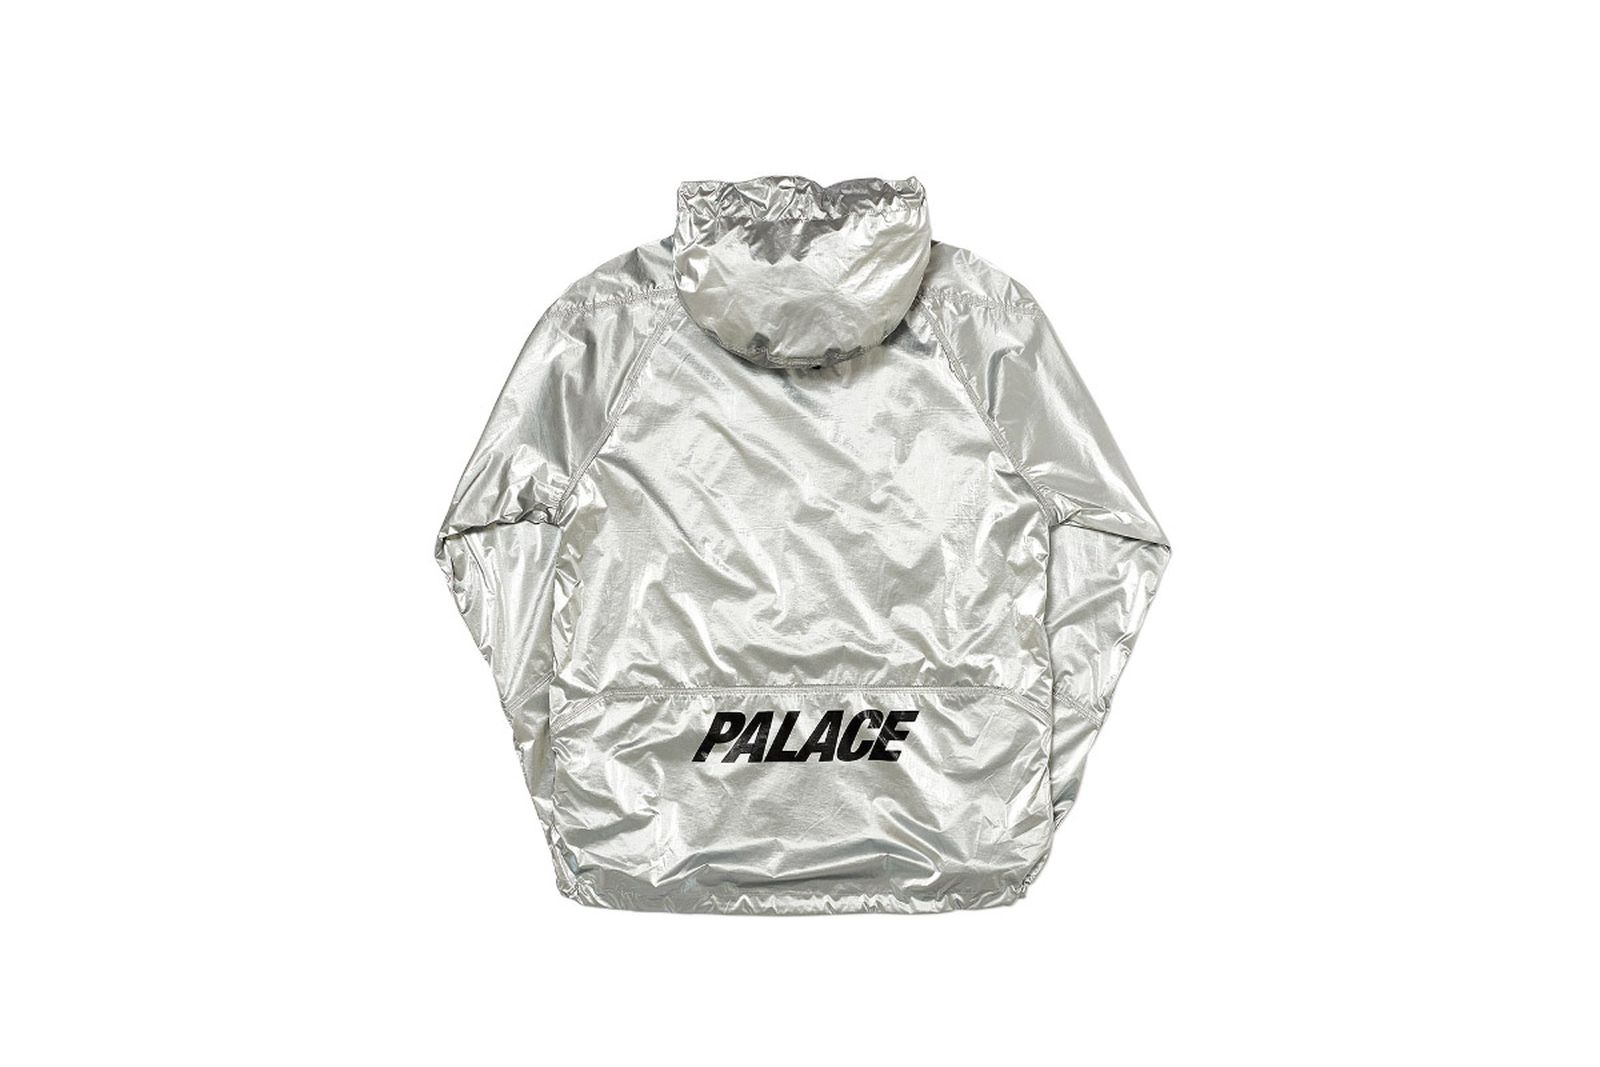 Palace 2019 Autumn Jacket G Loss Jacket silver back fw19